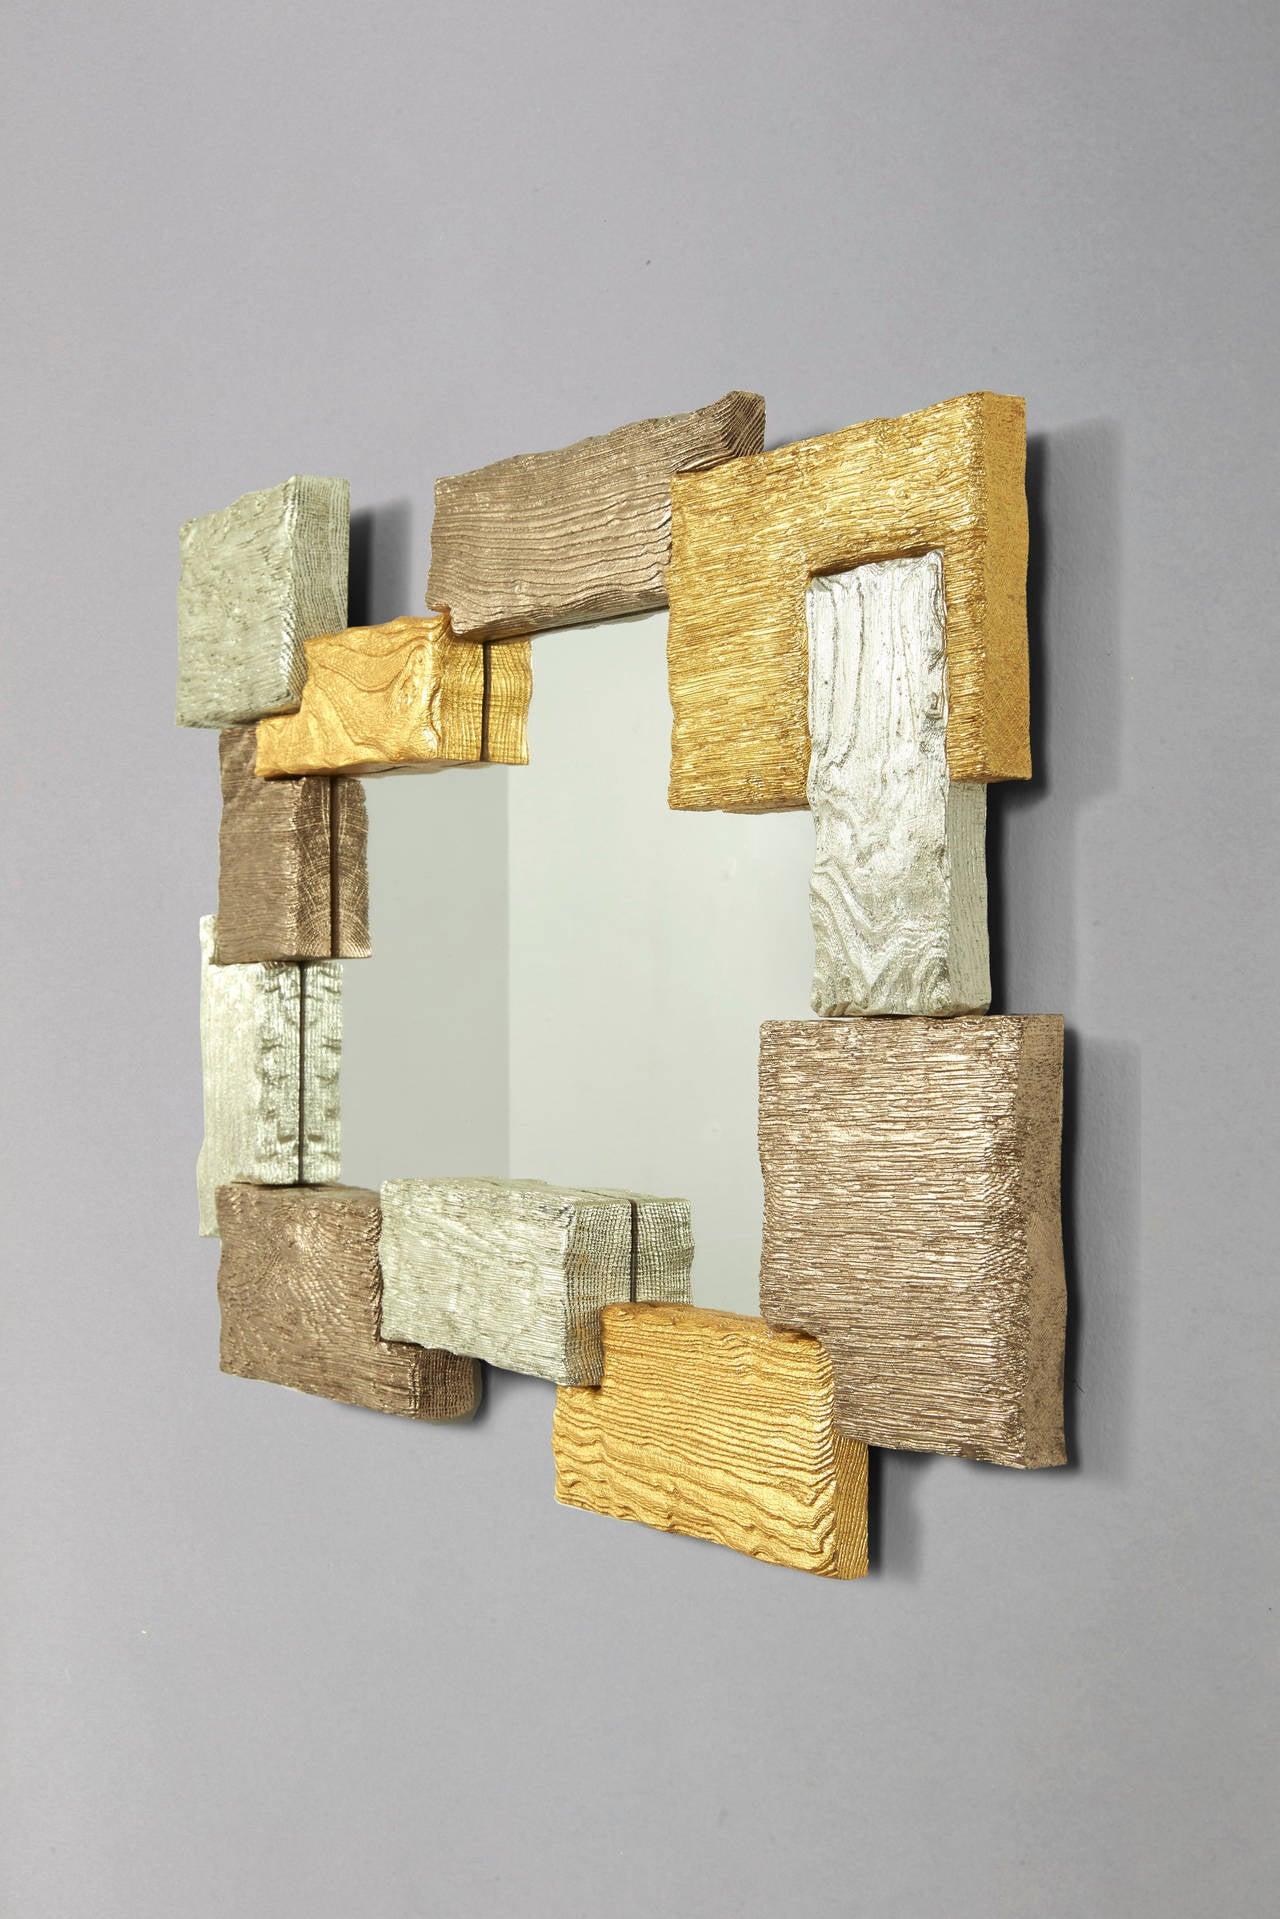 MUR Cat-Berro edition 2013. Mirror. Scarified oak and elmwood. Gold leaves. L 19